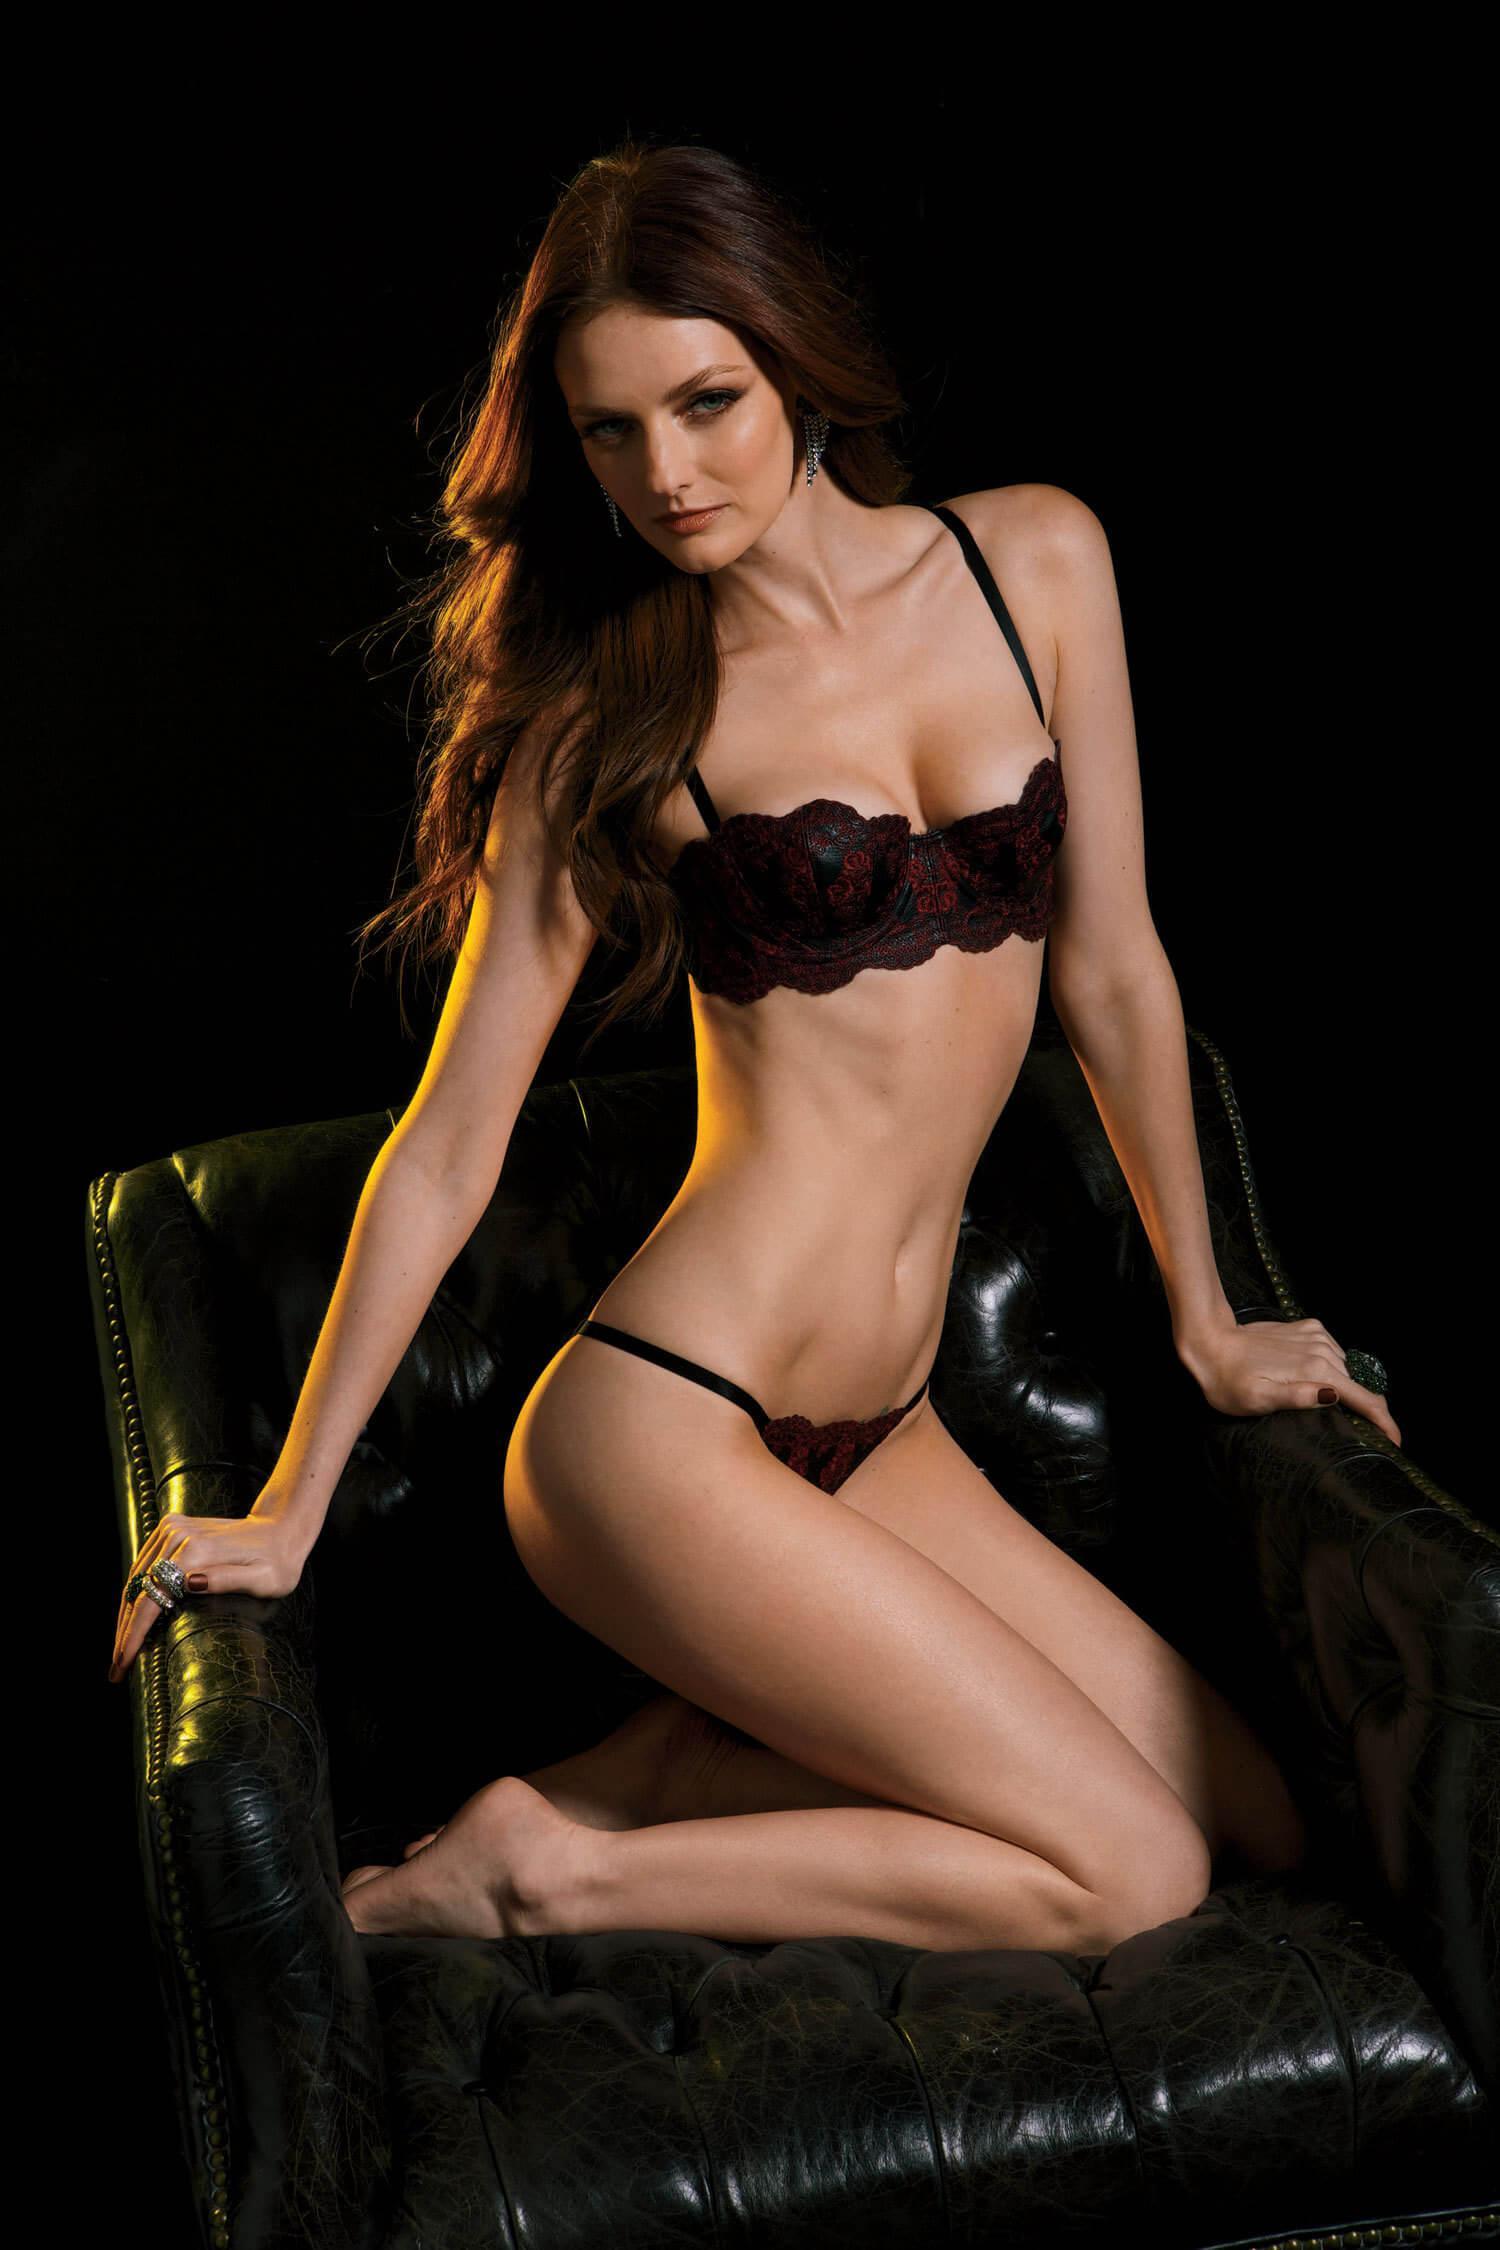 Lydia Hearst hot lingerie pics